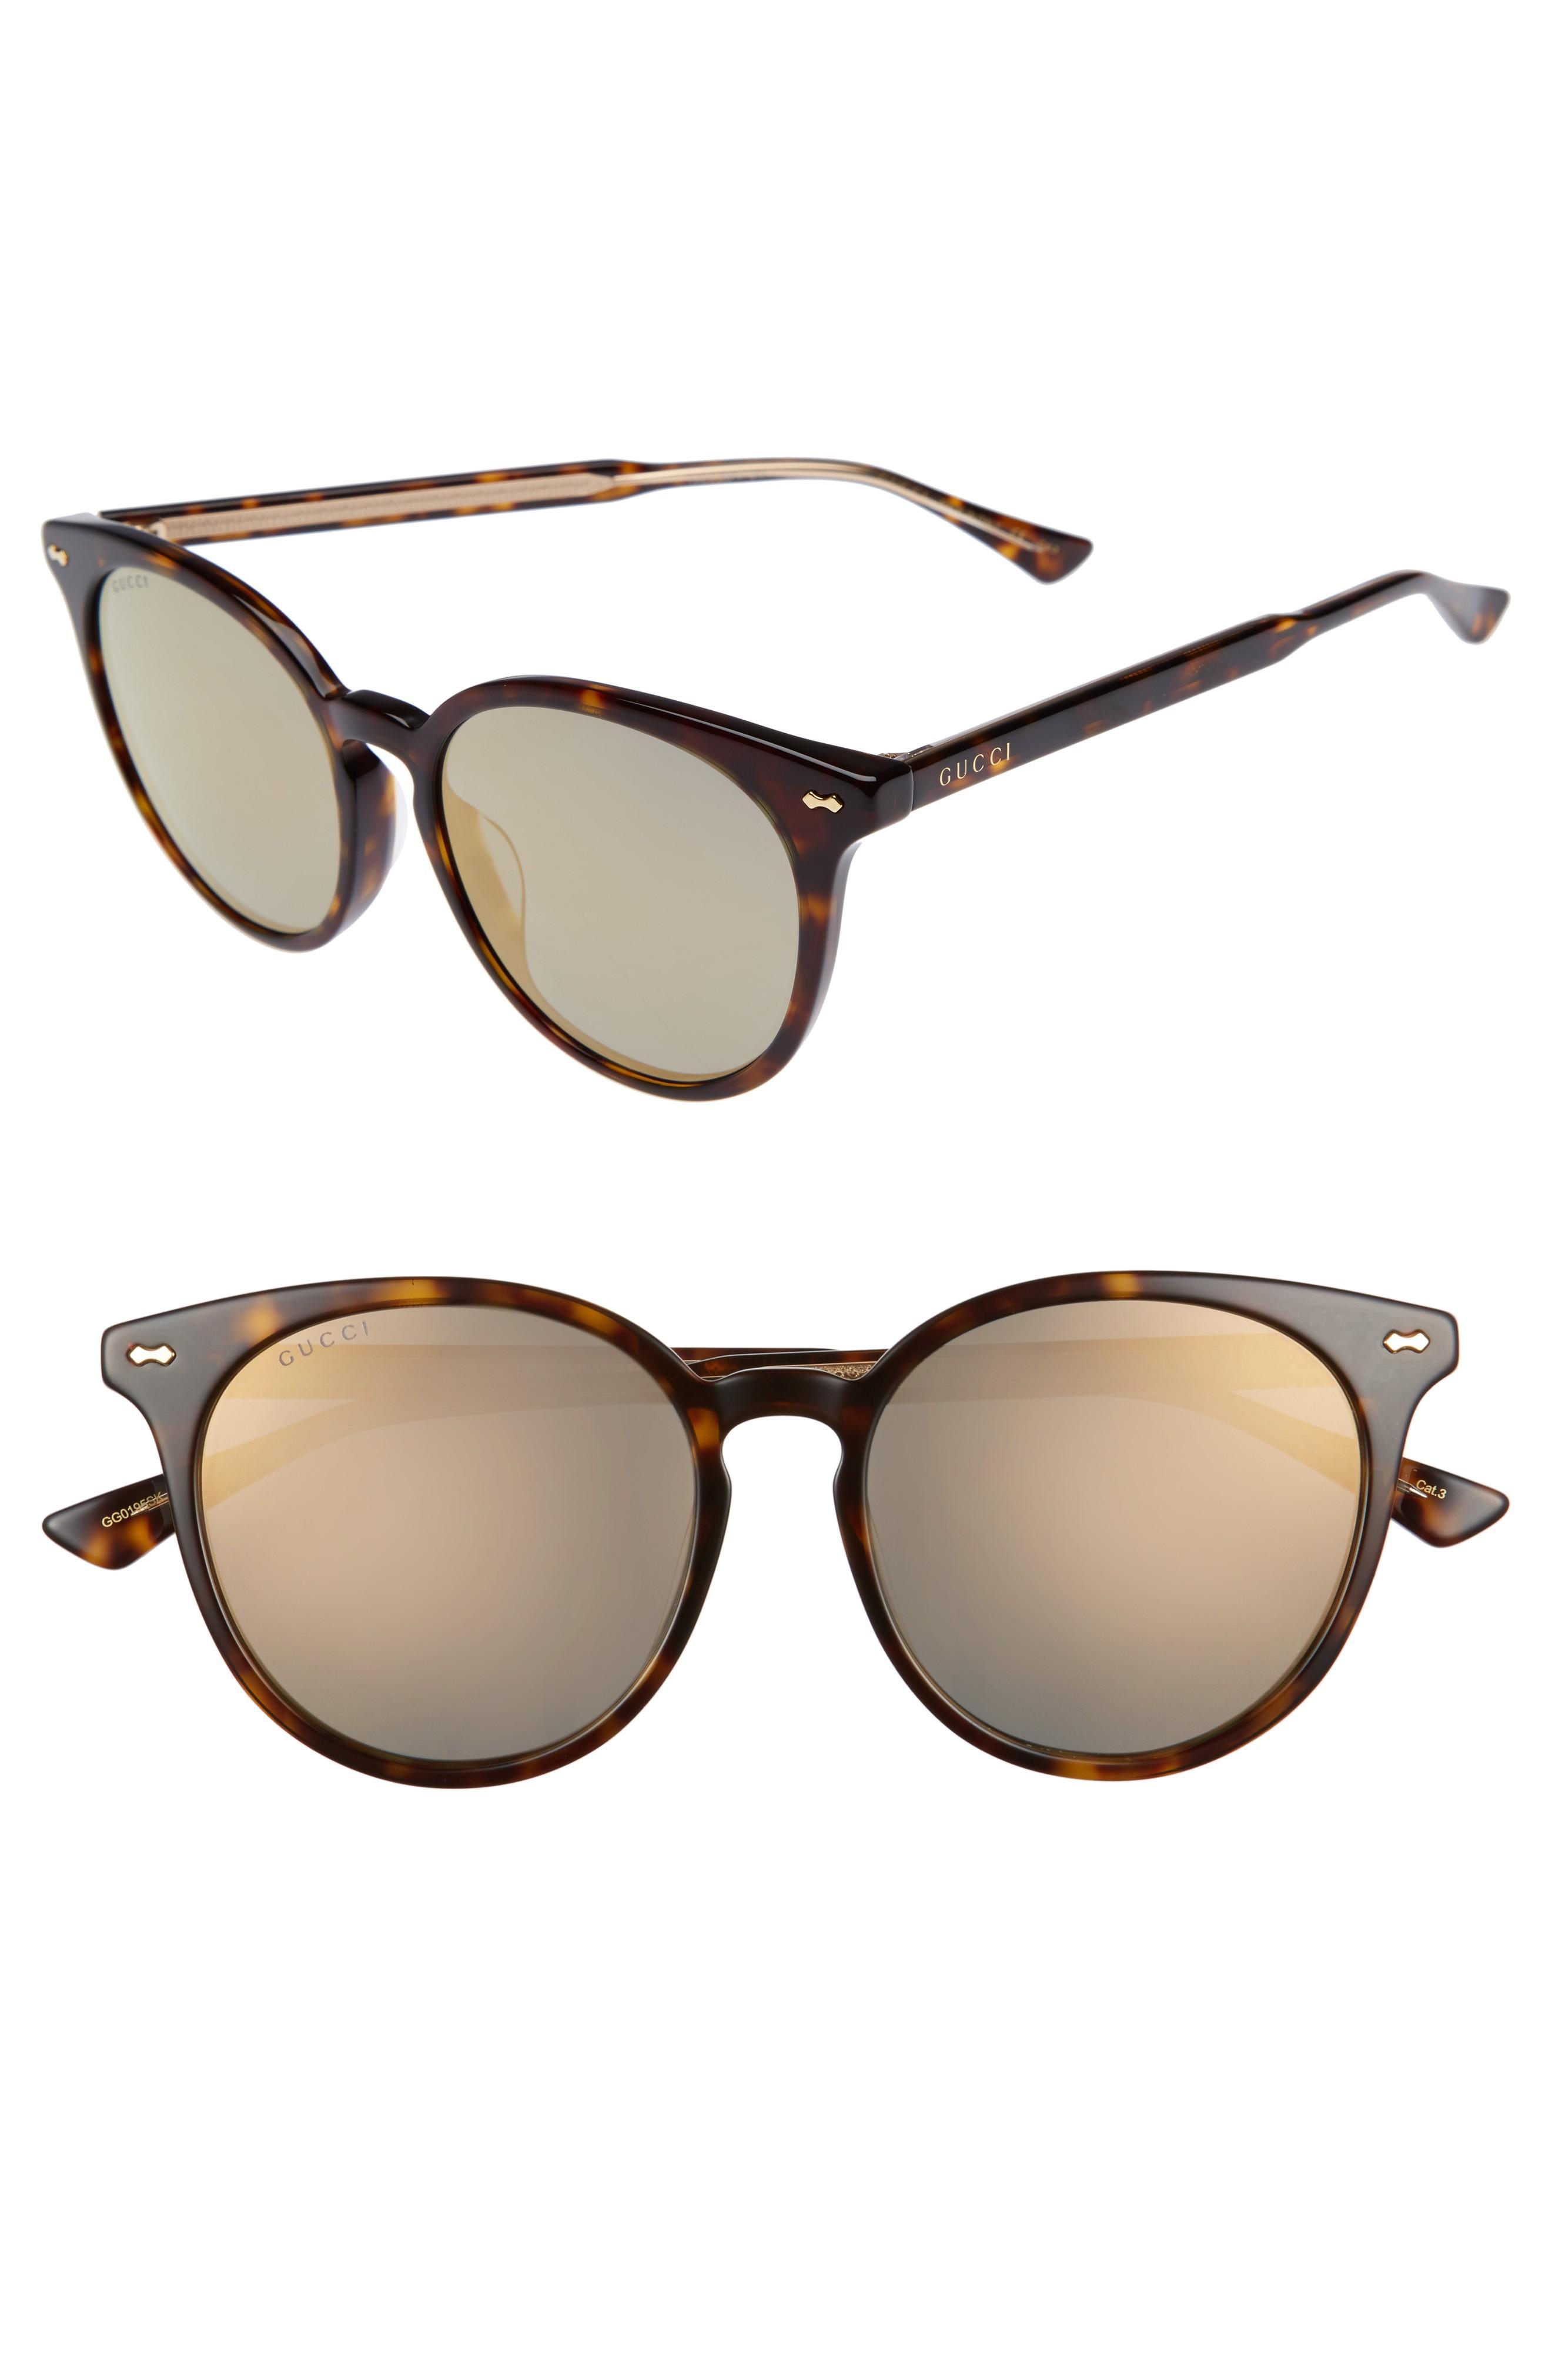 54789cc4882bd Gucci 55Mm Round Cat Eye Sunglasses - Havana